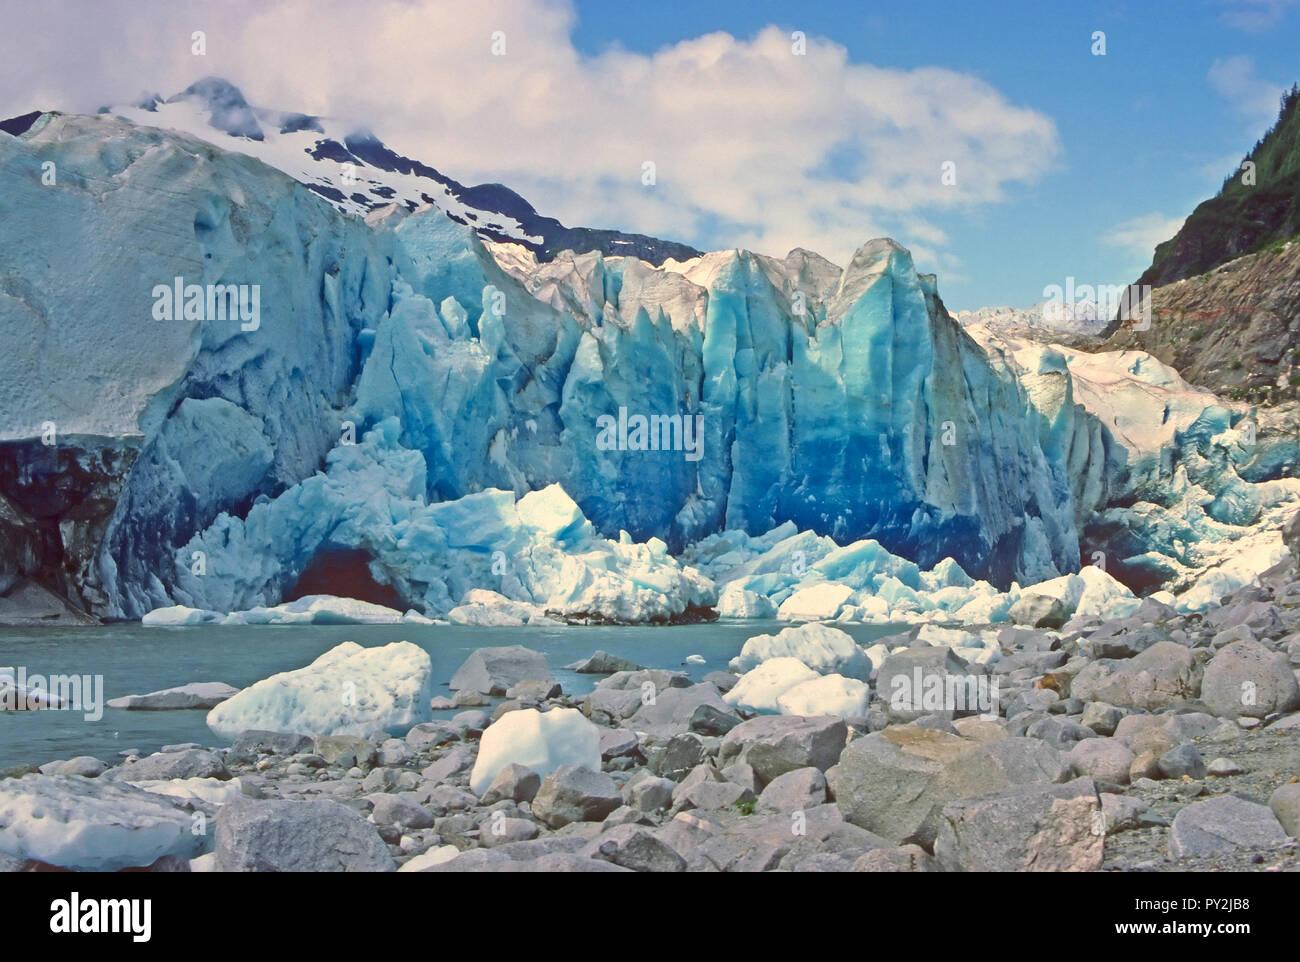 Freshly exposed glacial ice in the Mendenhall Glacier in Alaska - Stock Image